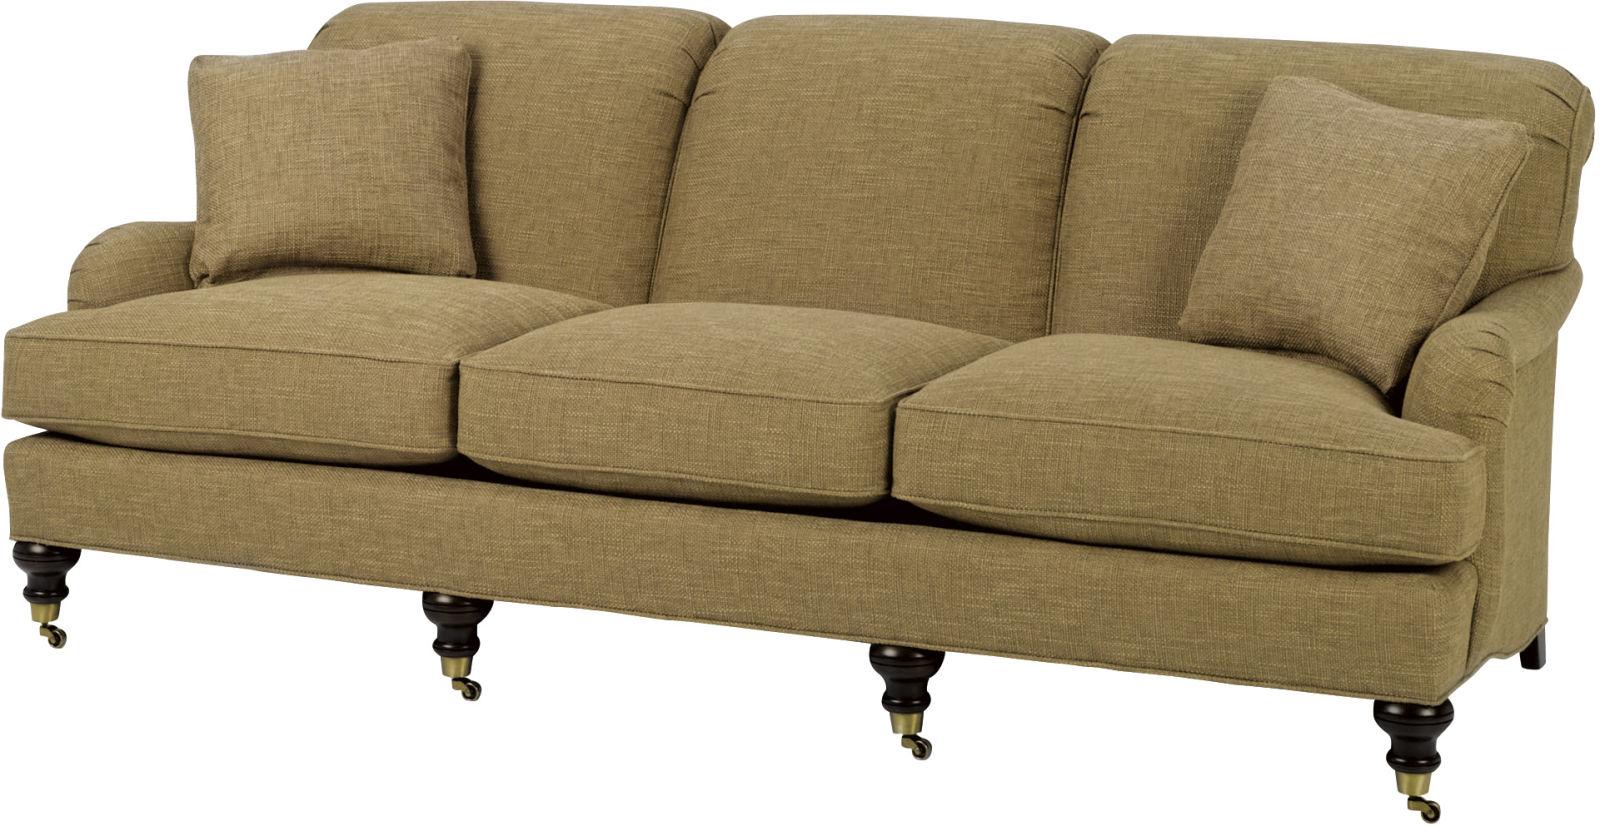 wesley hall sofas paramount sofa john lewis furniture - hickory, nc product page 1186 ...